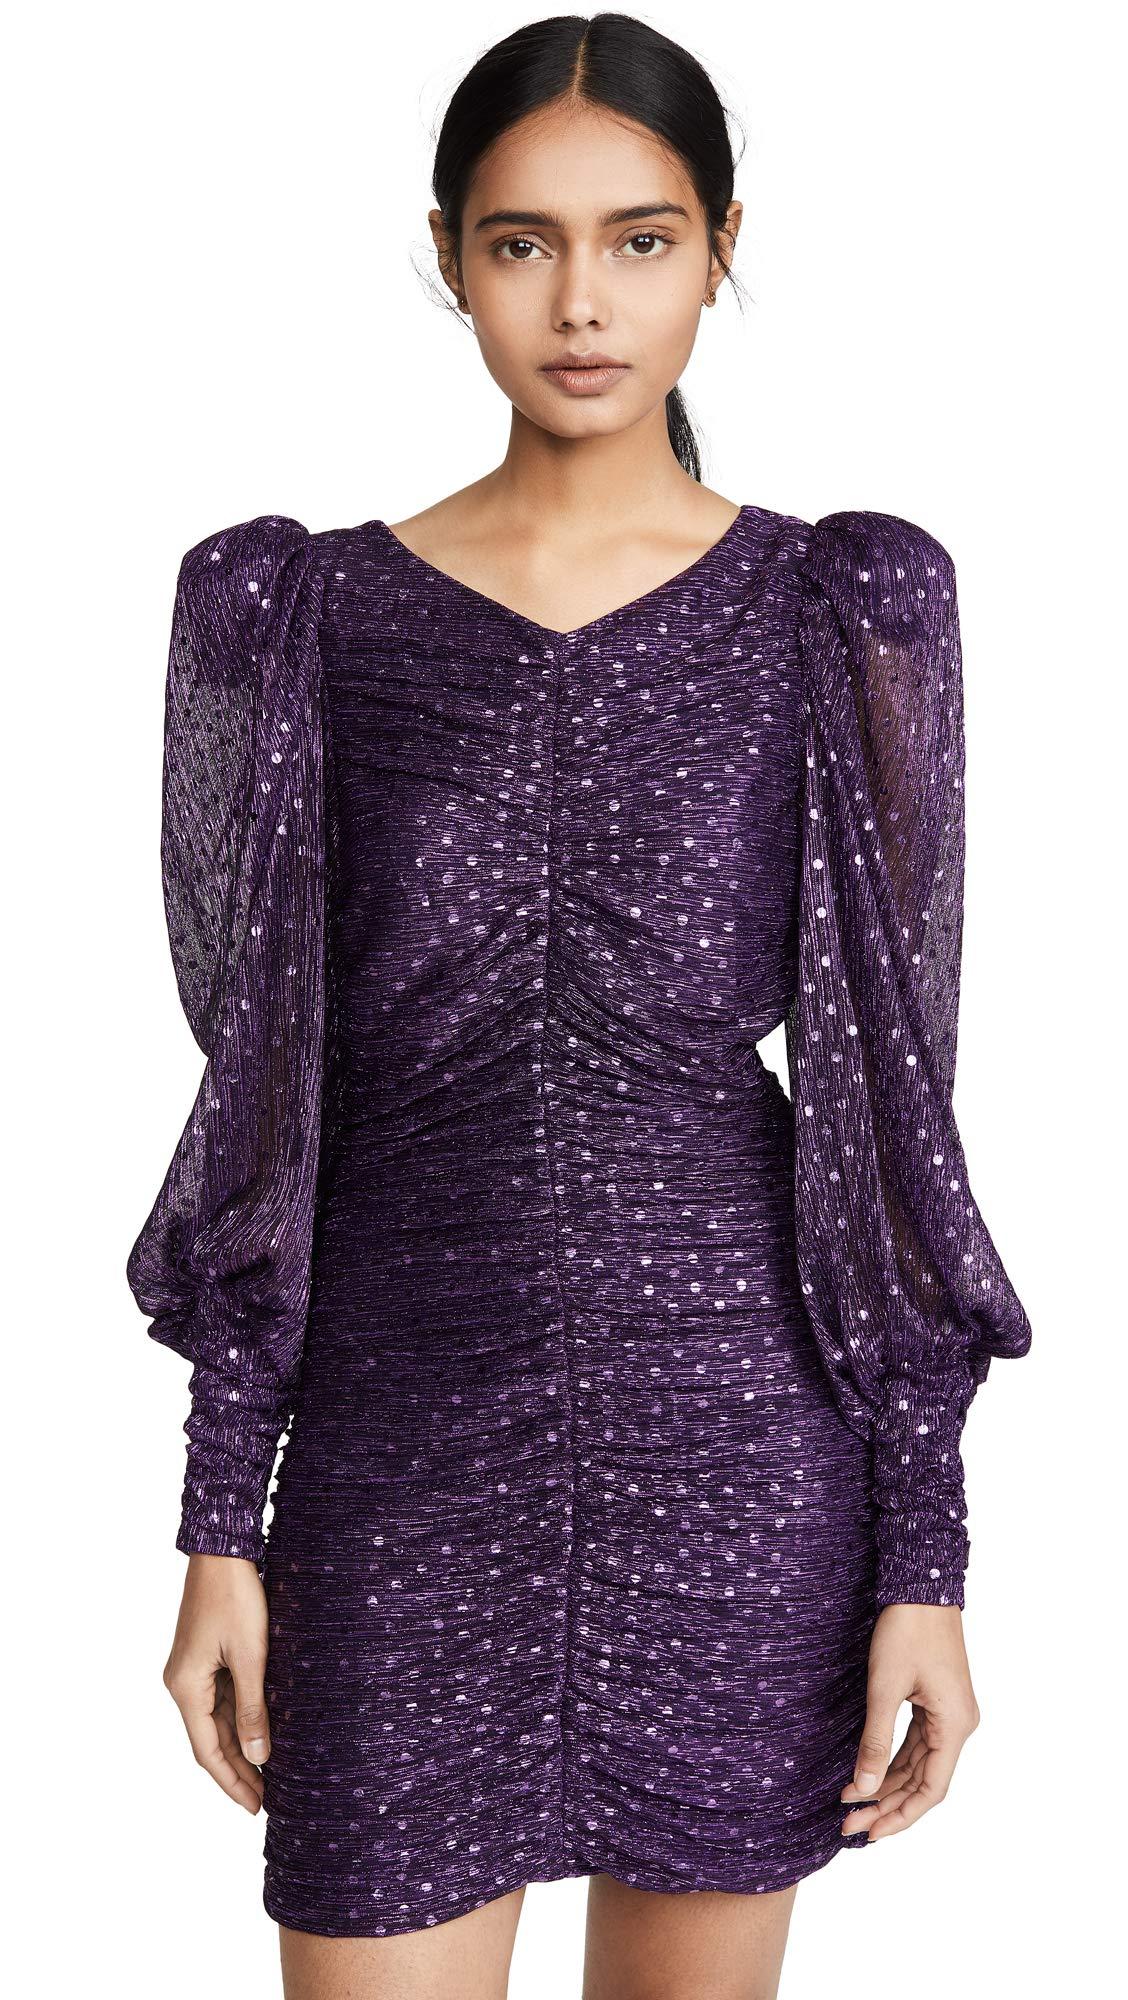 For Love & Lemons Women's La Villette Mini Dress